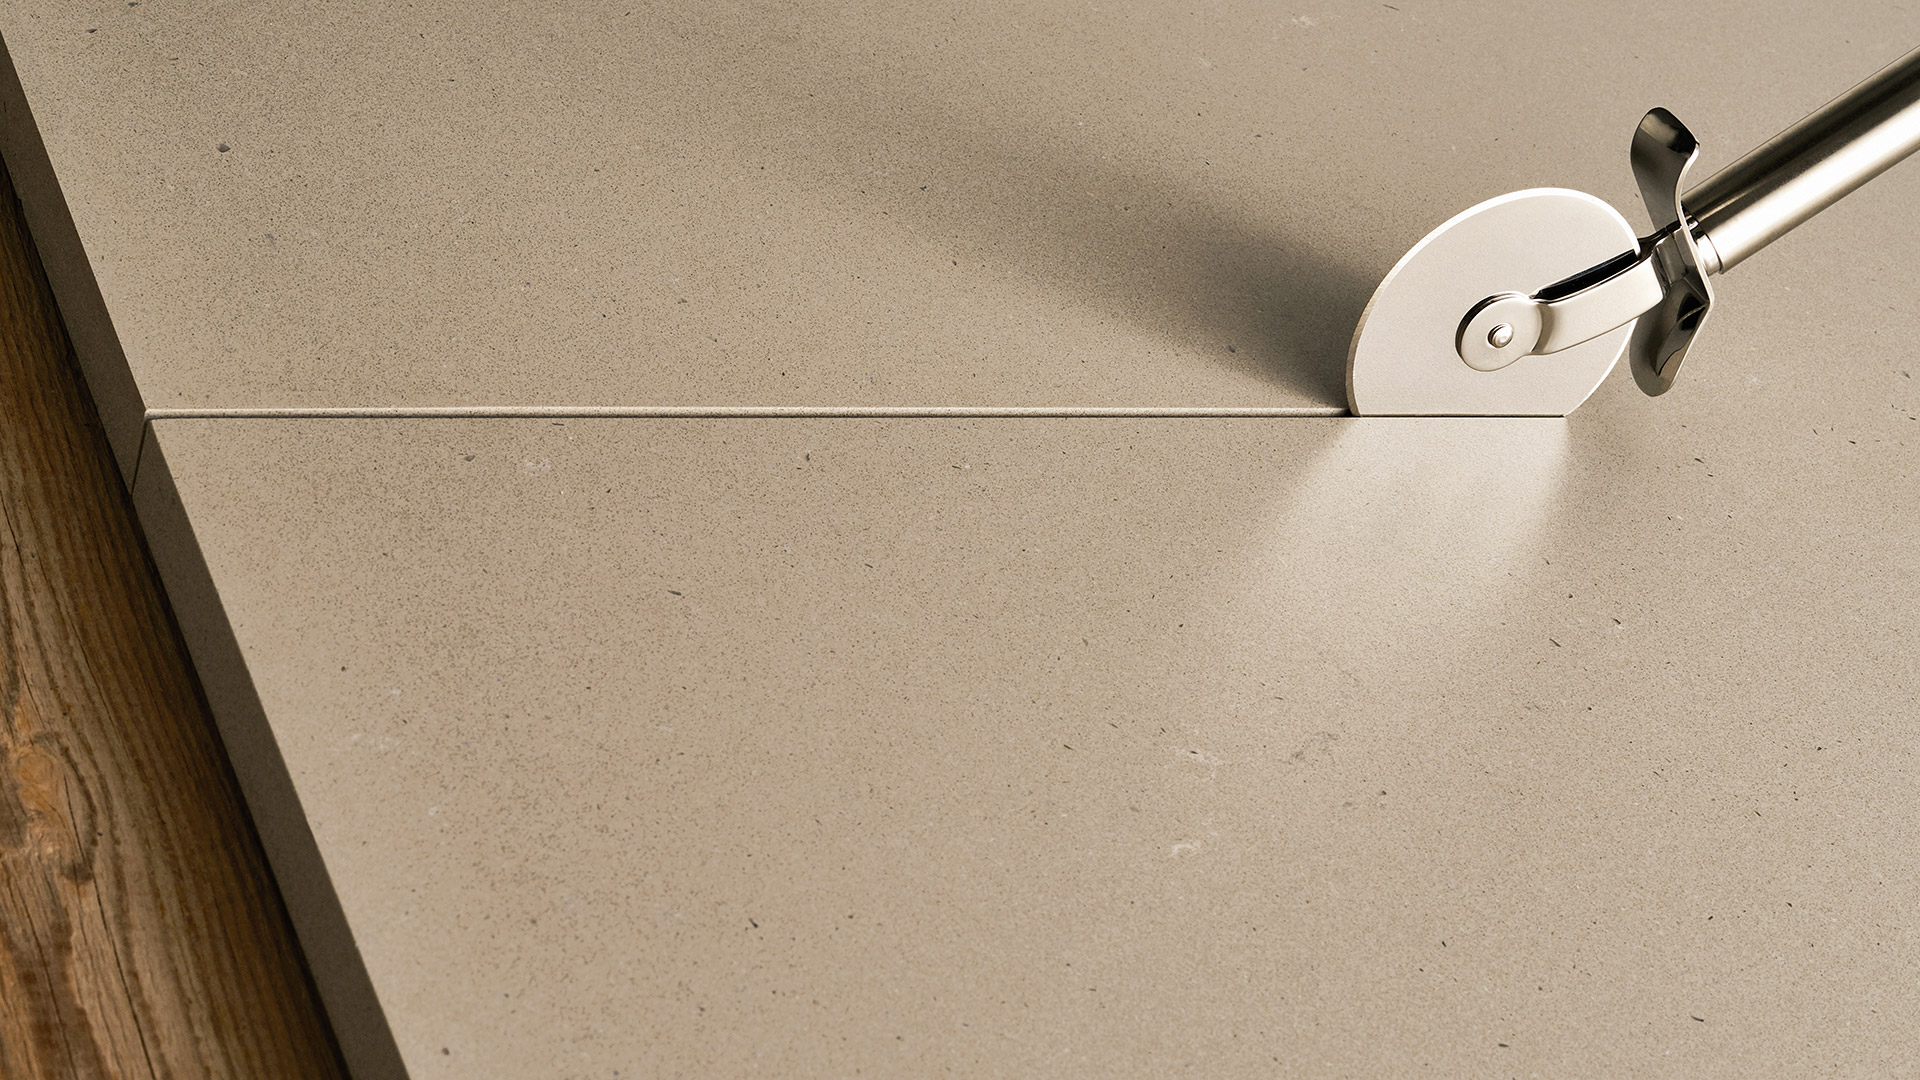 4004_Raw-Concrete_DPS-1920X1080-1